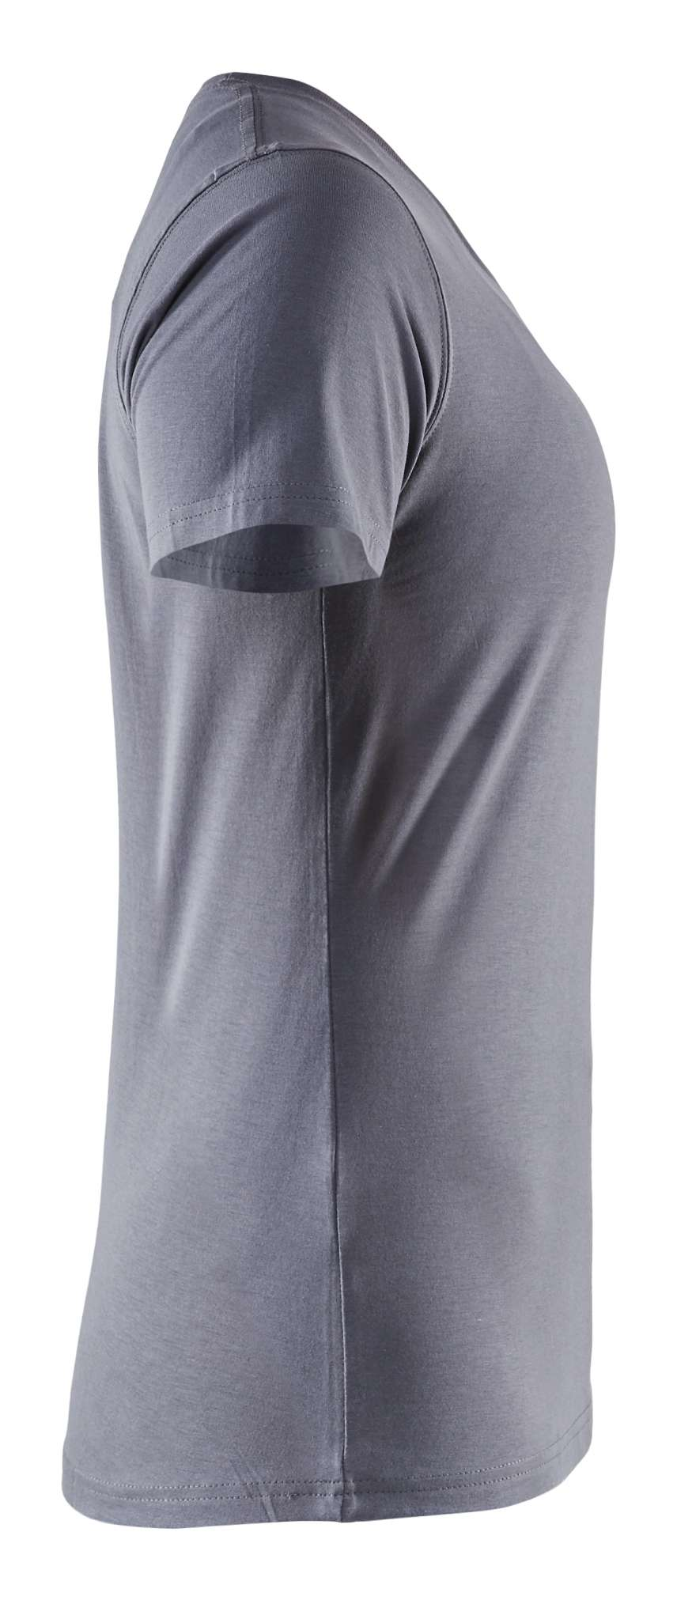 Blaklader Dames T-shirts 33341042 grijs(9400)